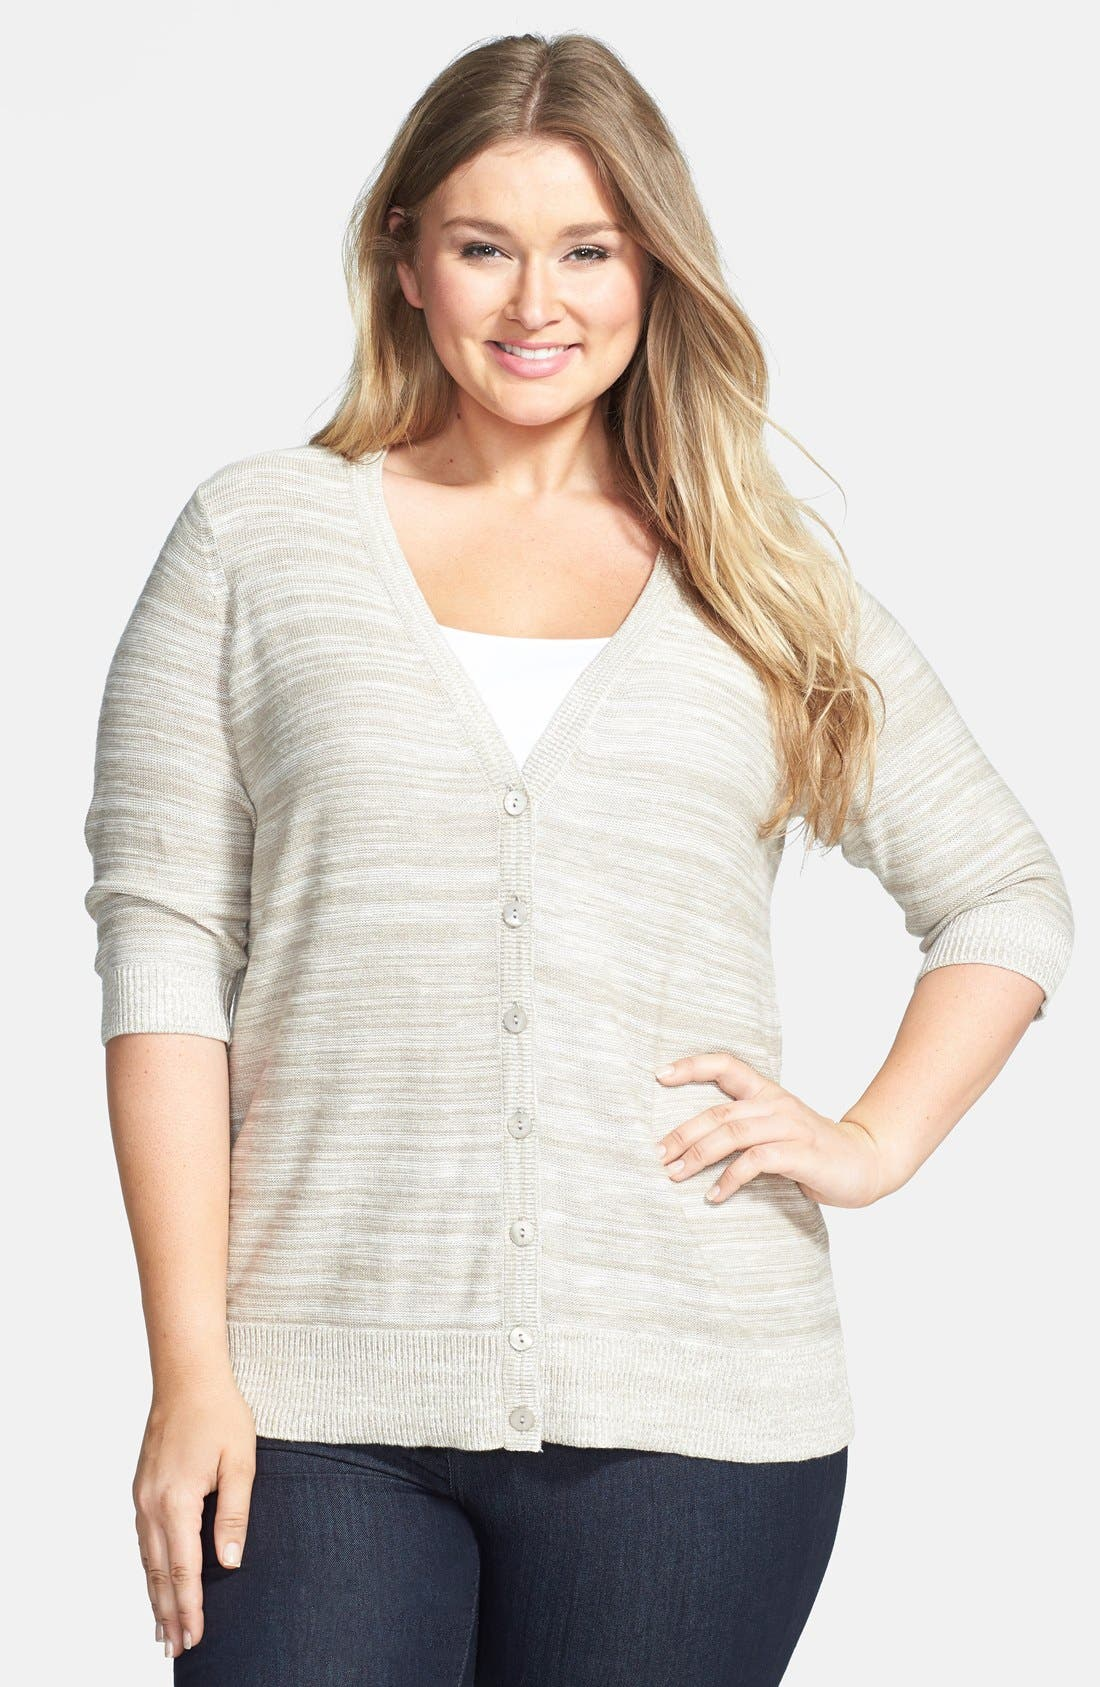 Alternate Image 1 Selected - Sejour Elbow Sleeve Cotton Blend V-Neck Cardigan (Plus Size)